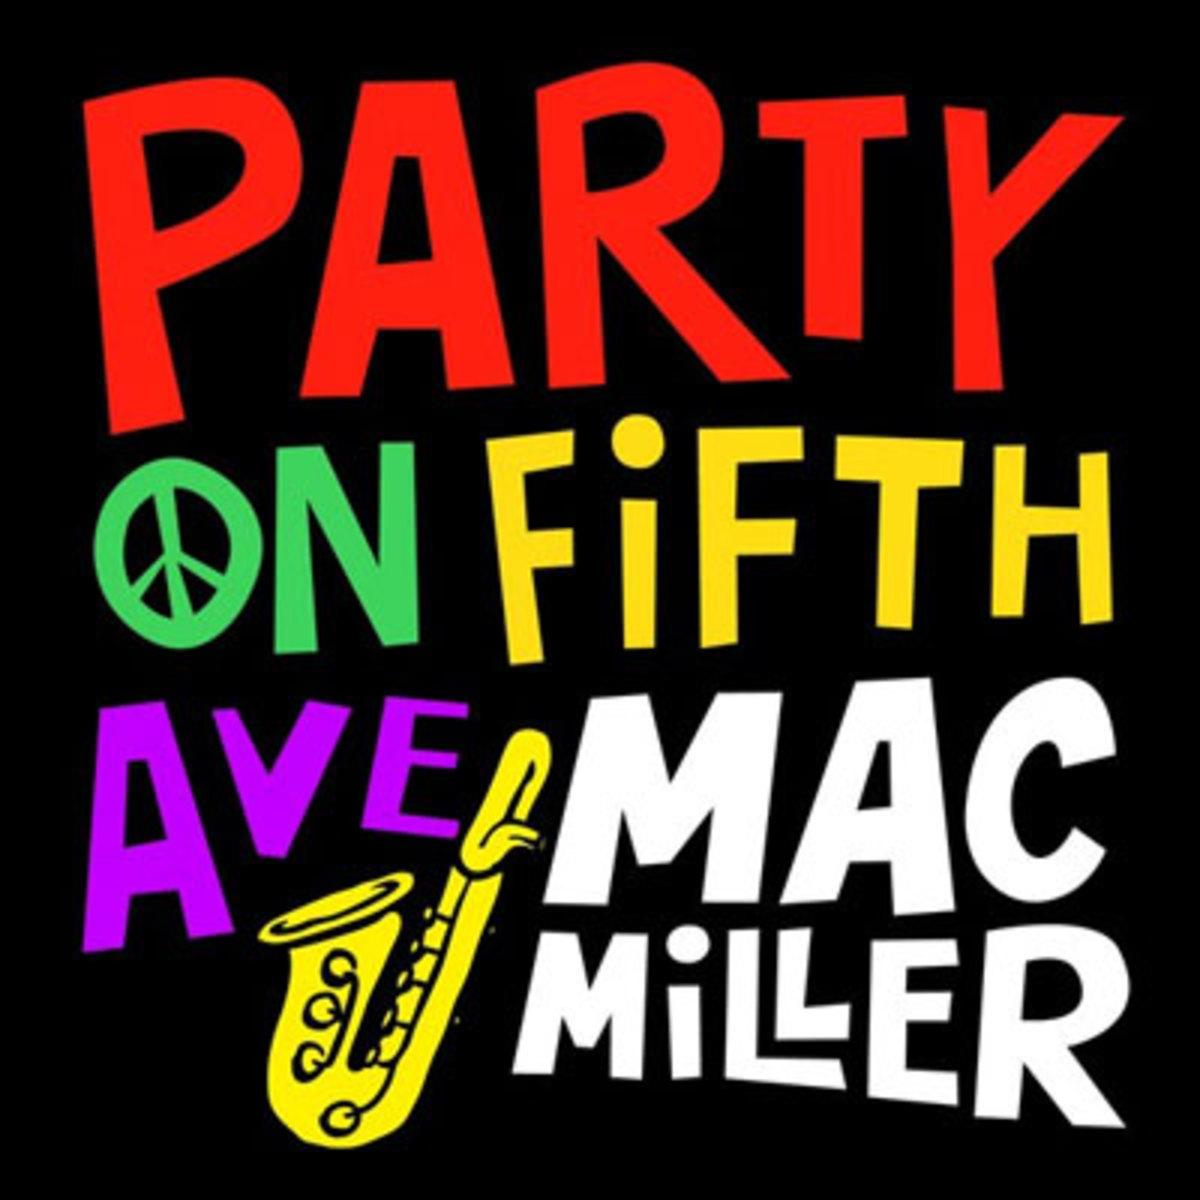 macmiller-partyonfifthave.jpg